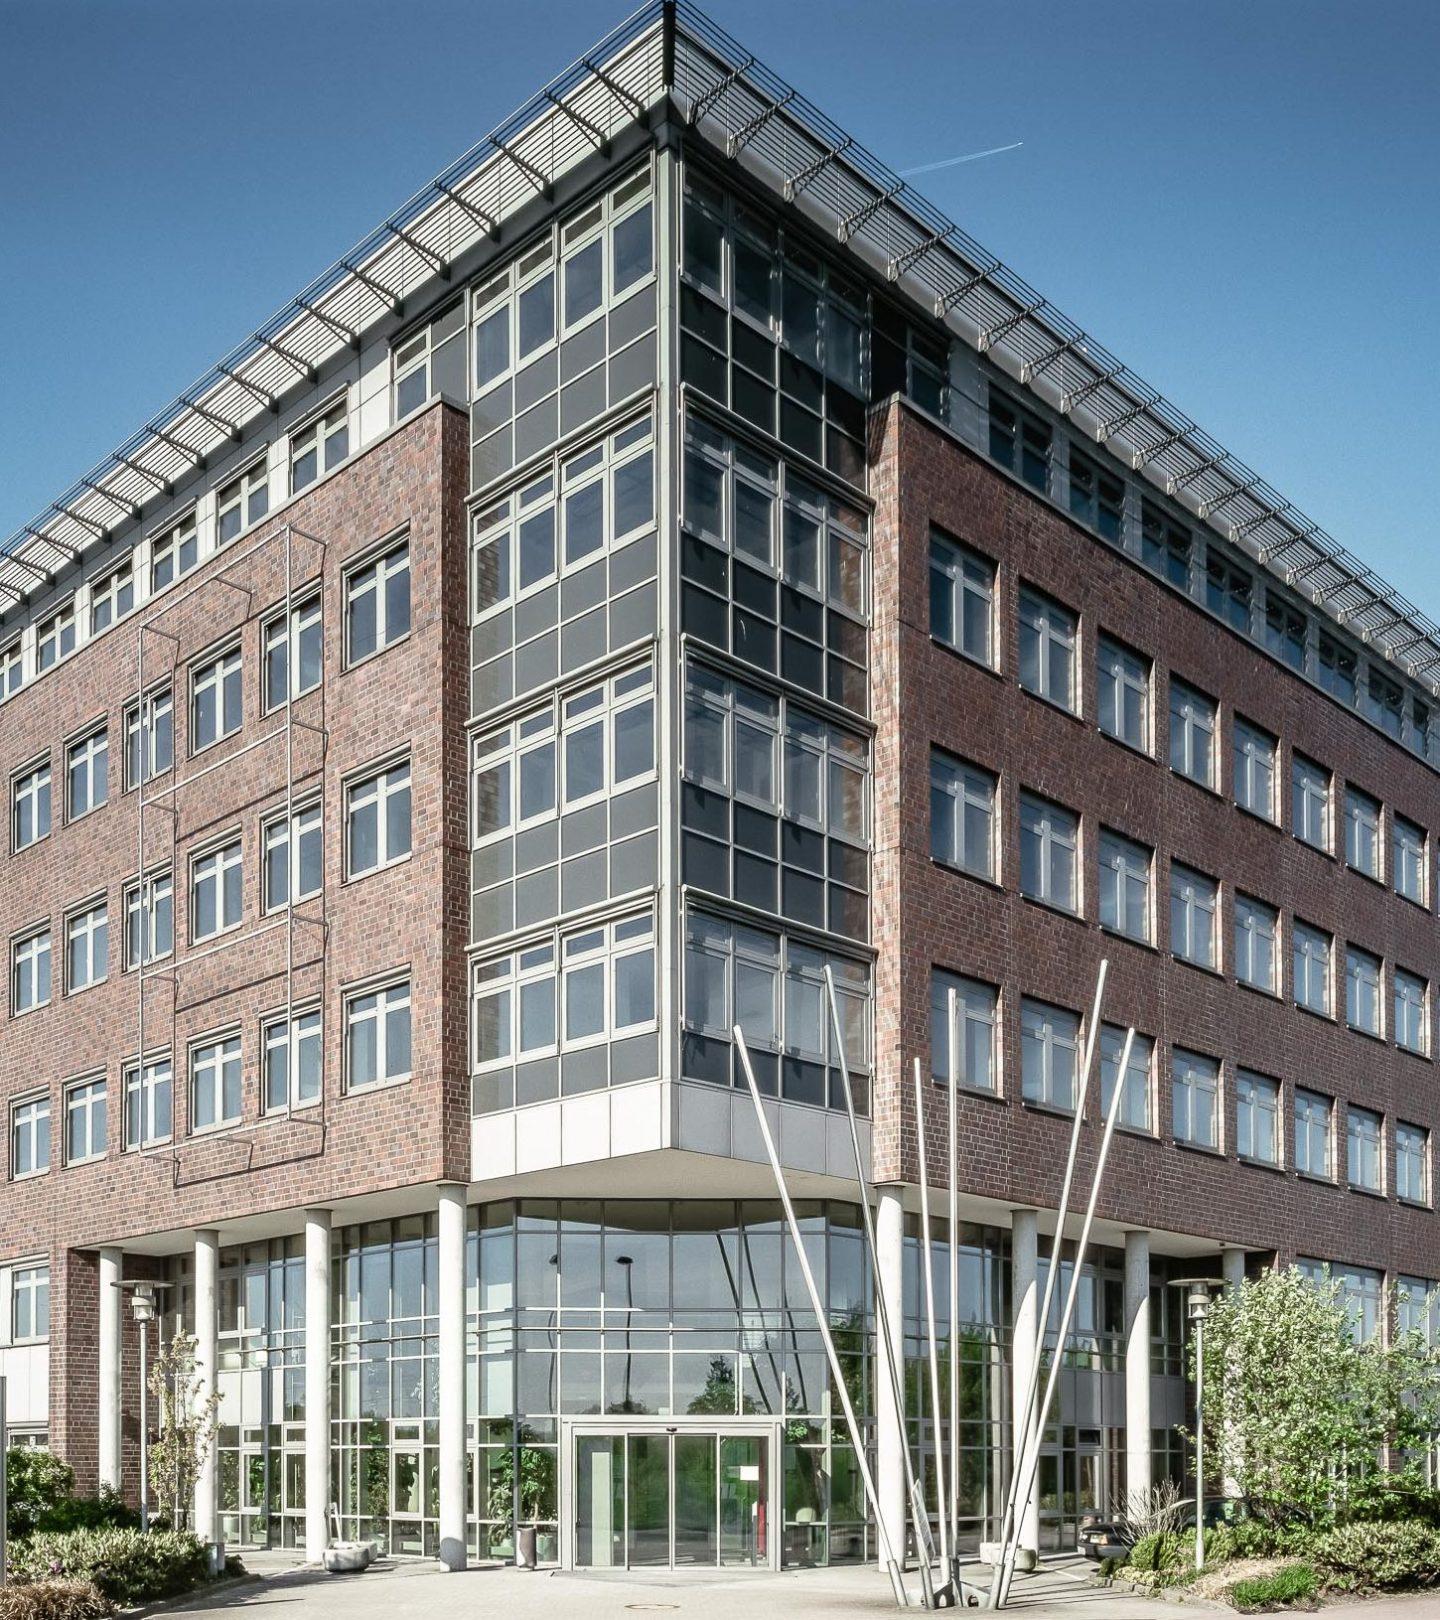 Kreisverwaltung Pinnberg - Hautpeingang